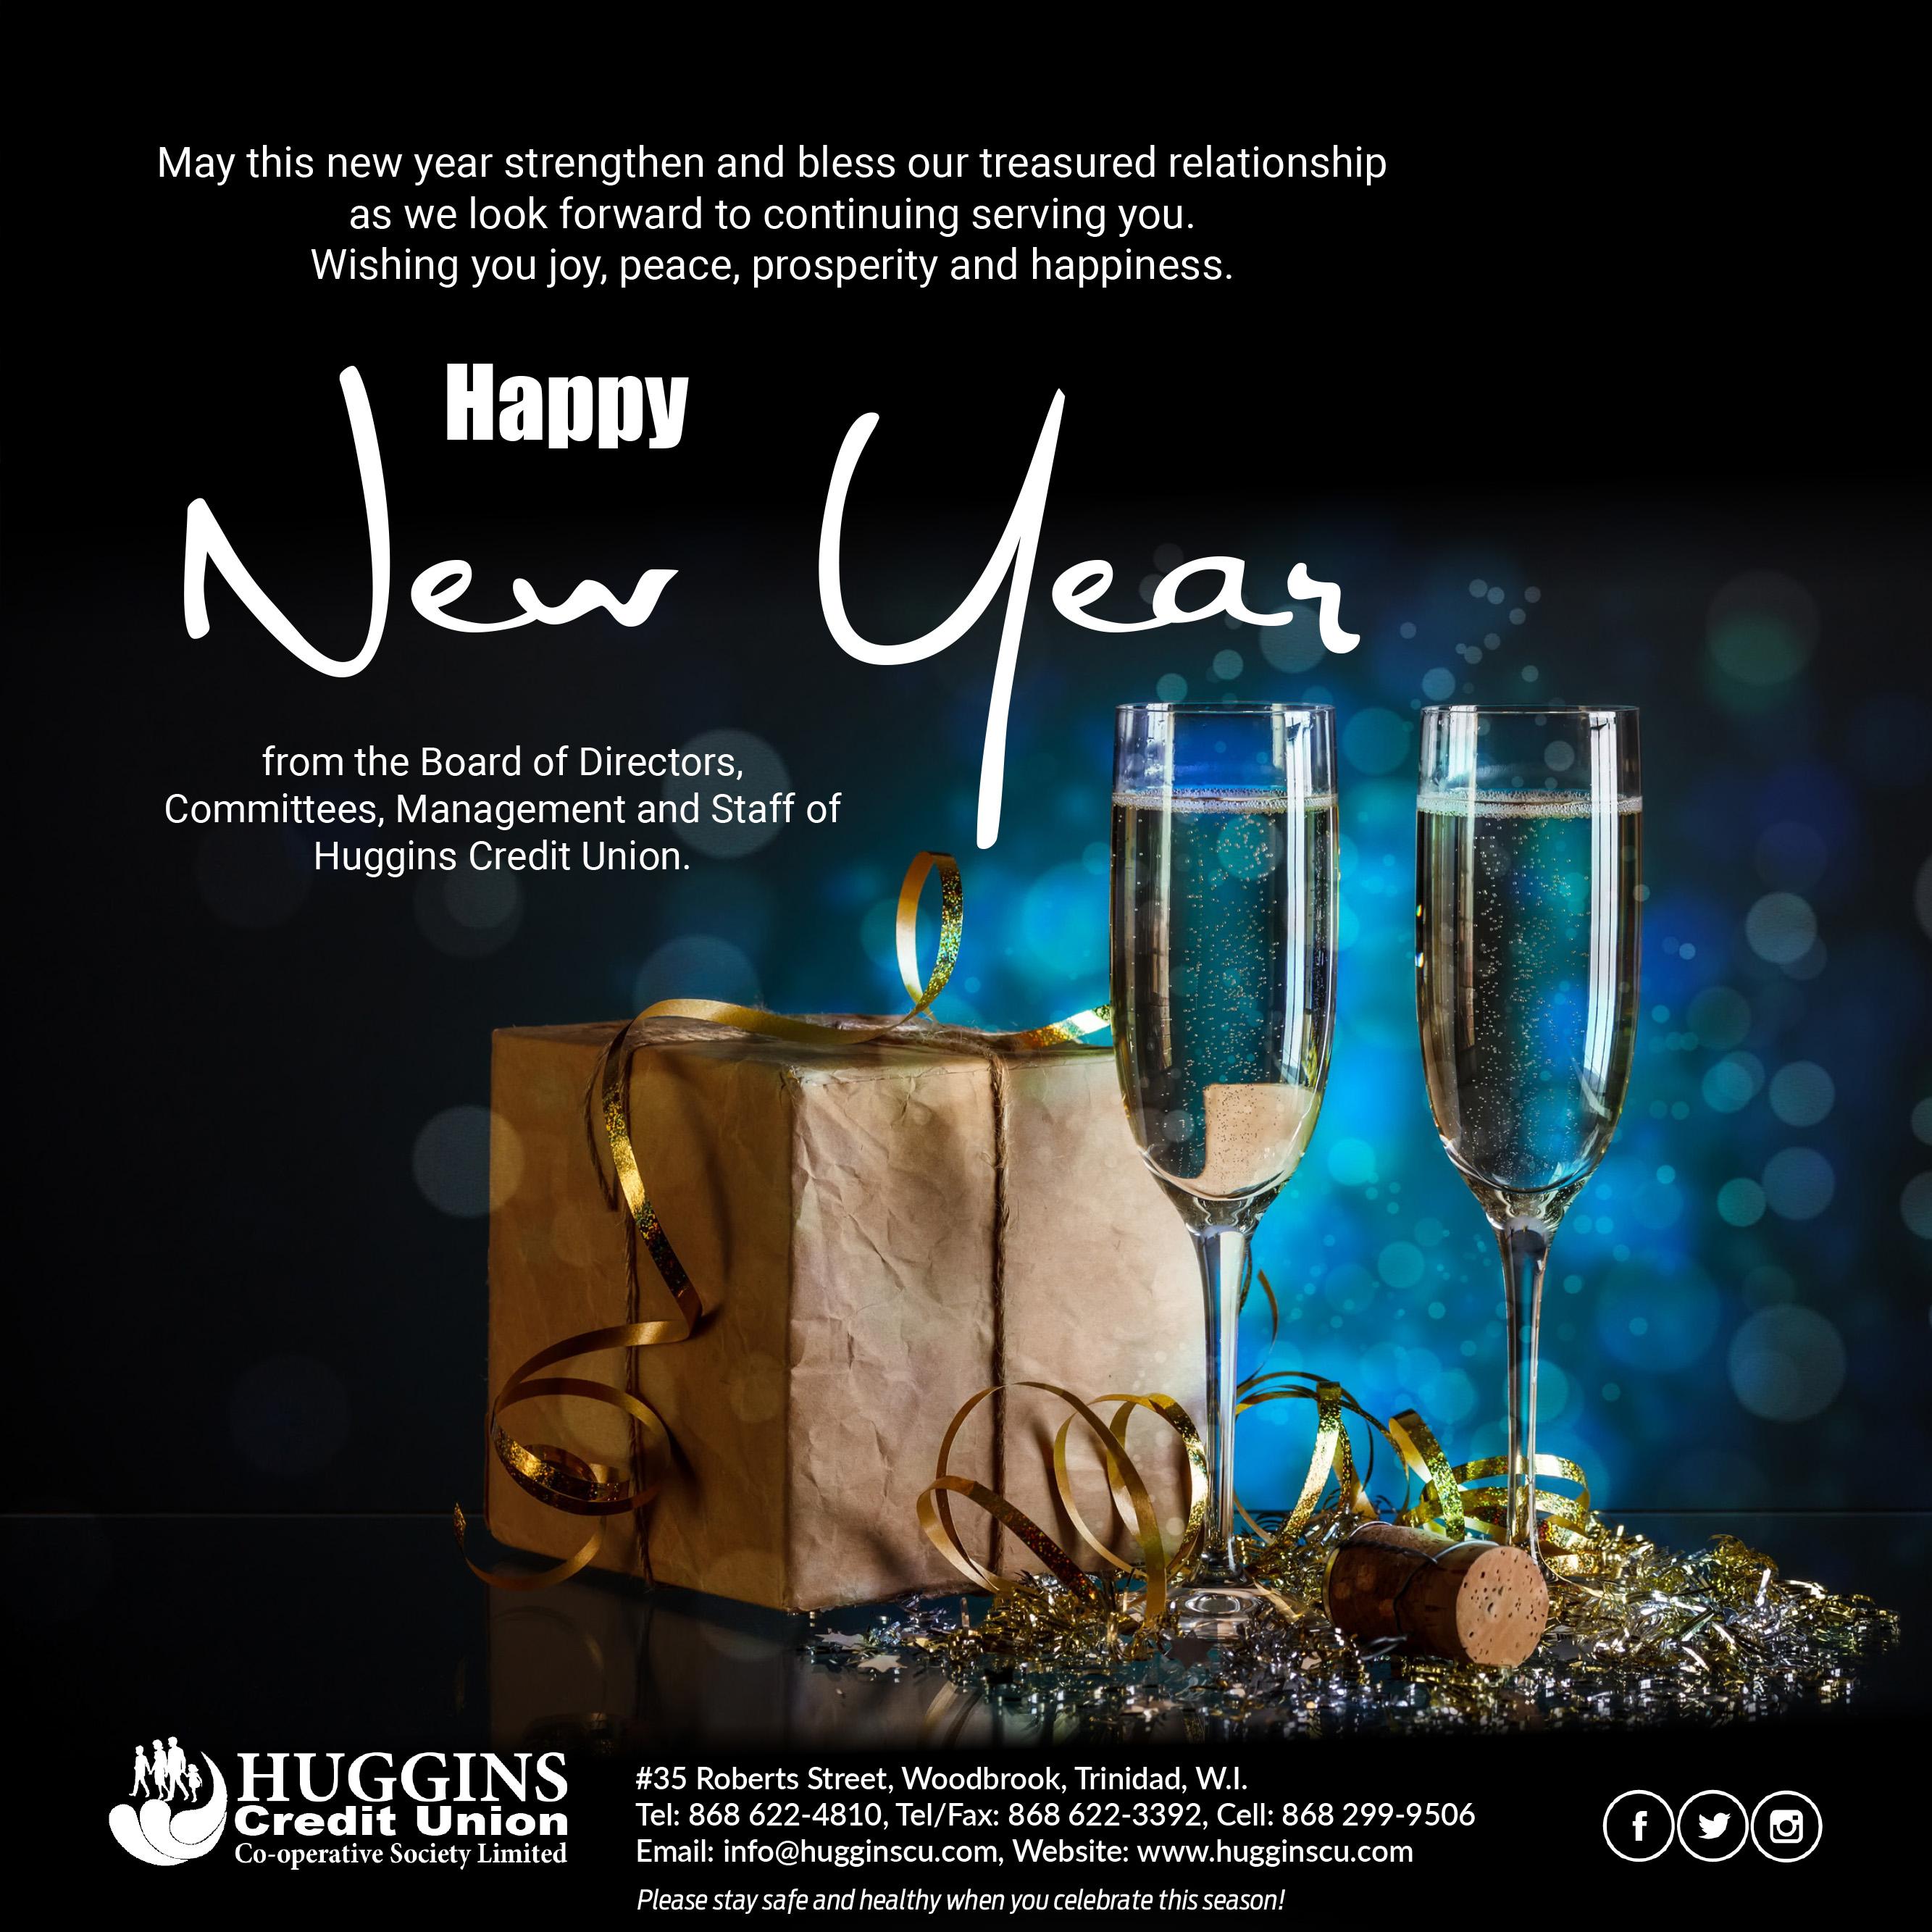 Huggins 2021 New Year Greetings